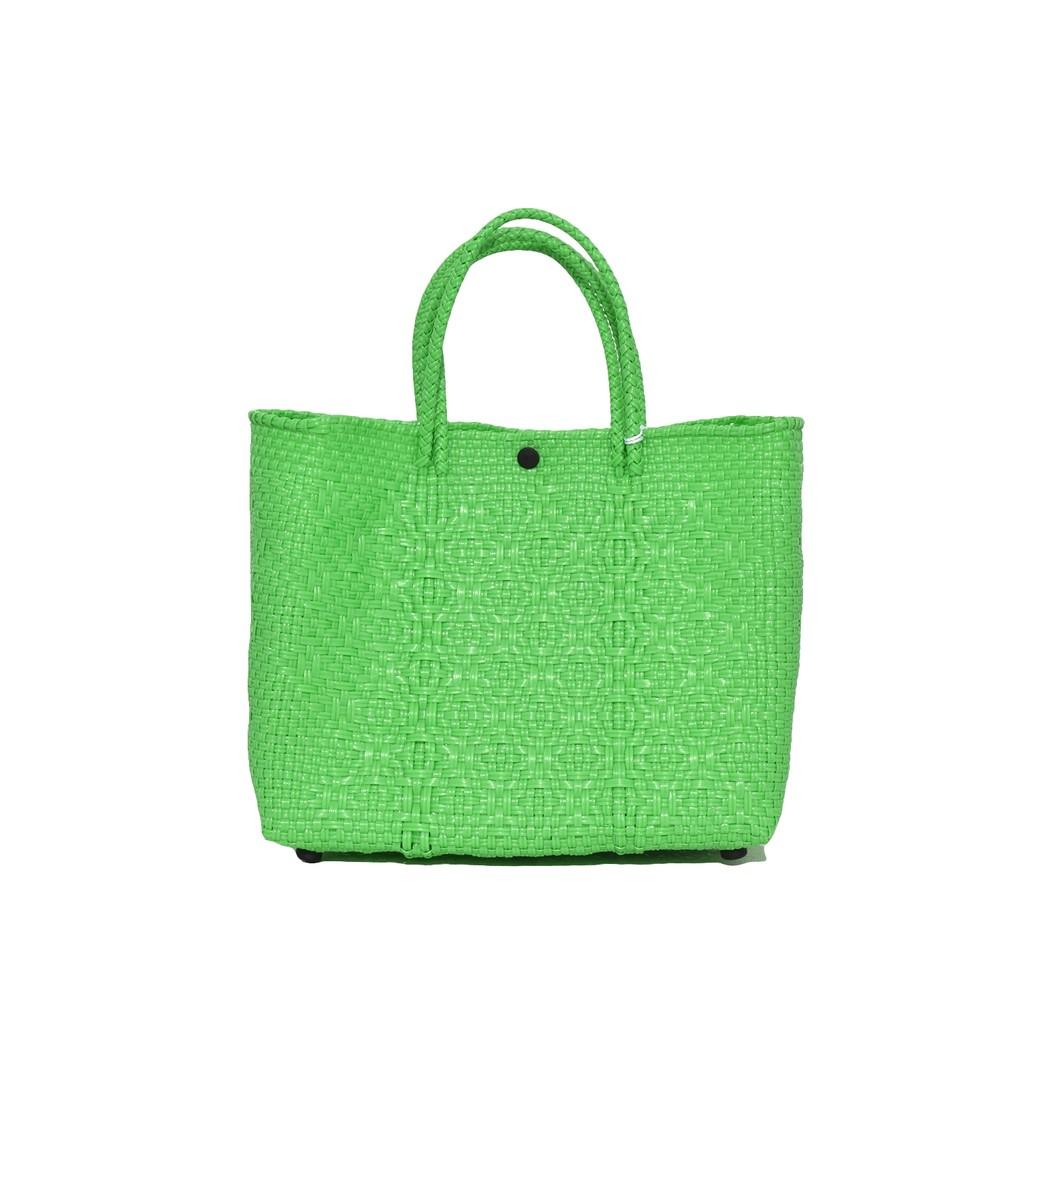 TRUSS Green Small Tote Bag